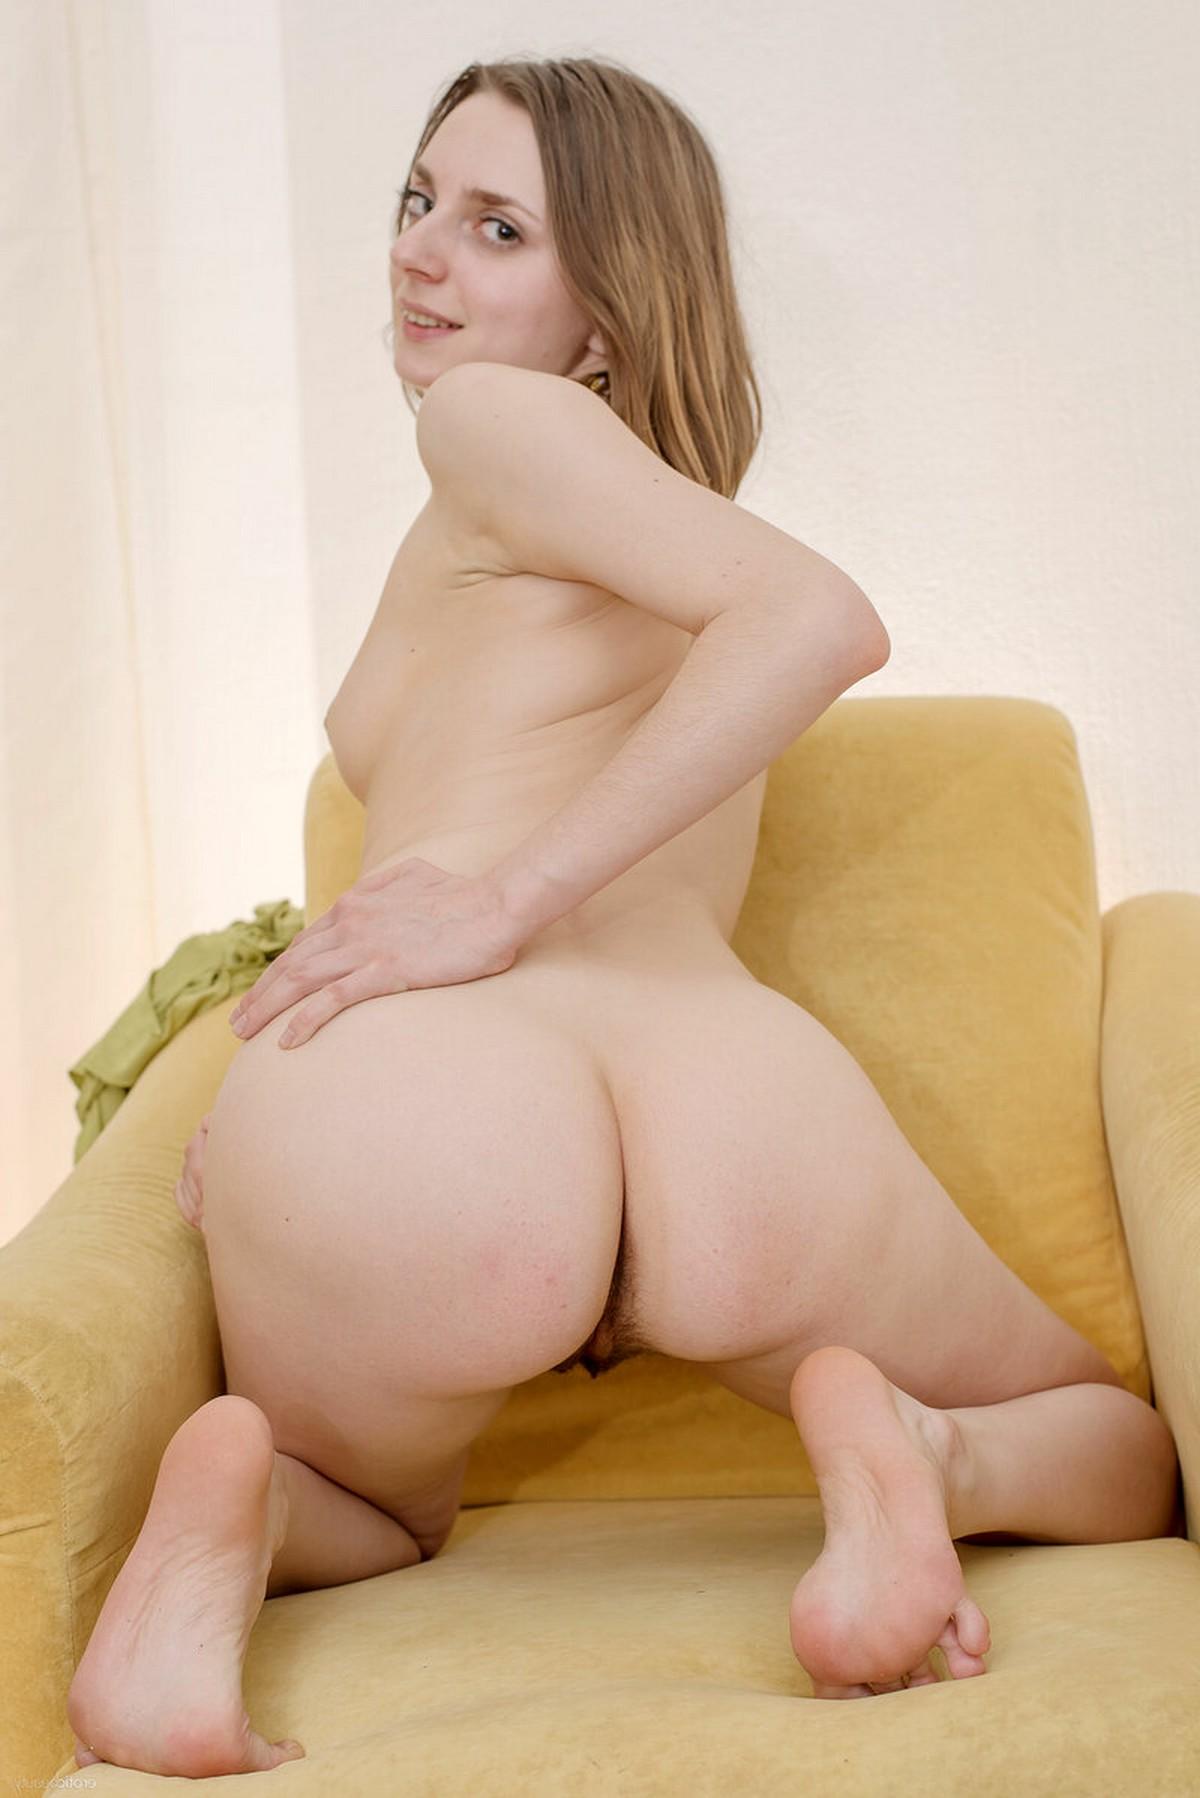 goldie blair bondage